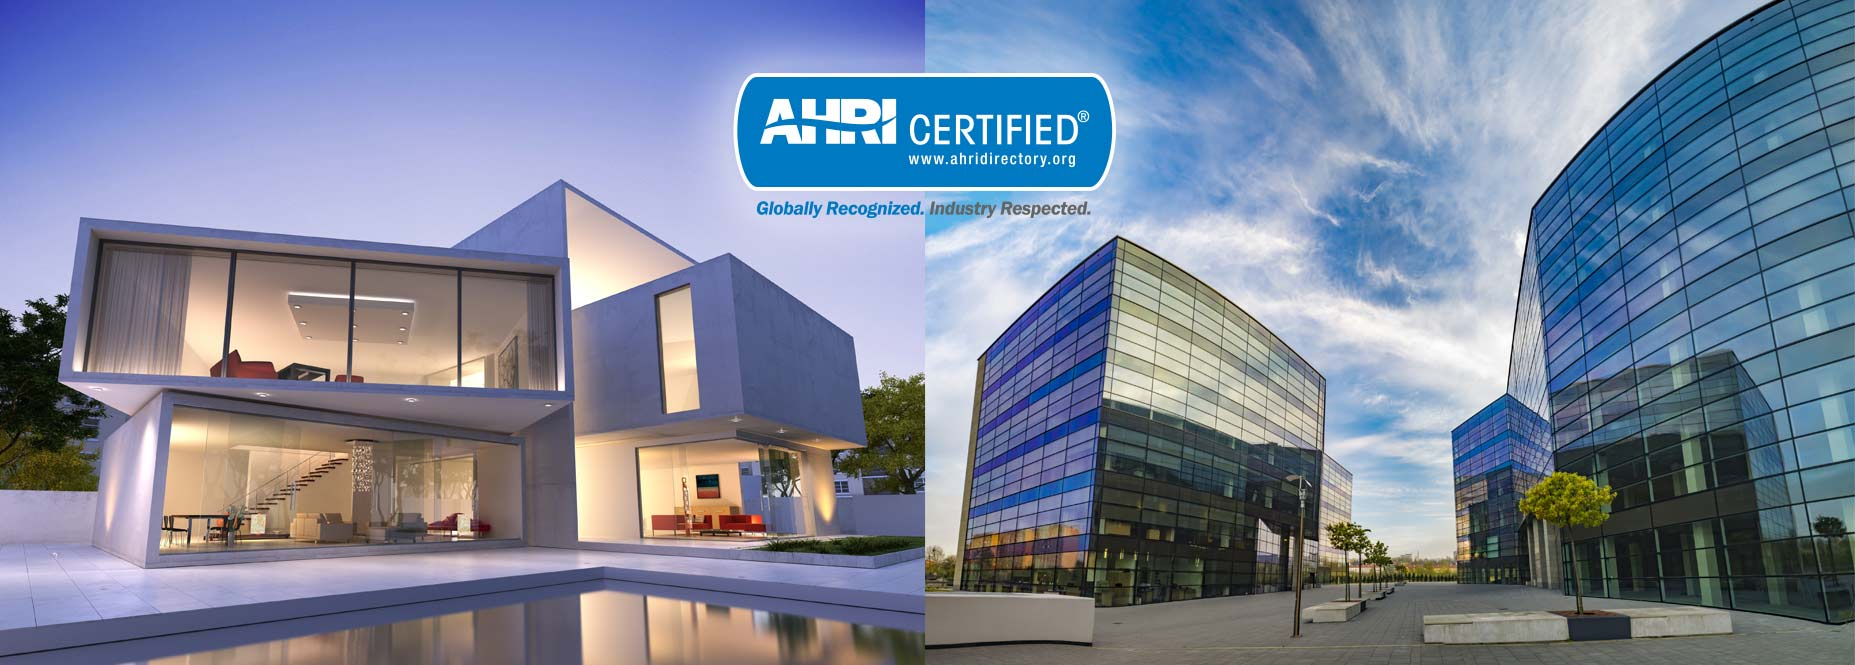 Ventacity is Now AHRI-Certified